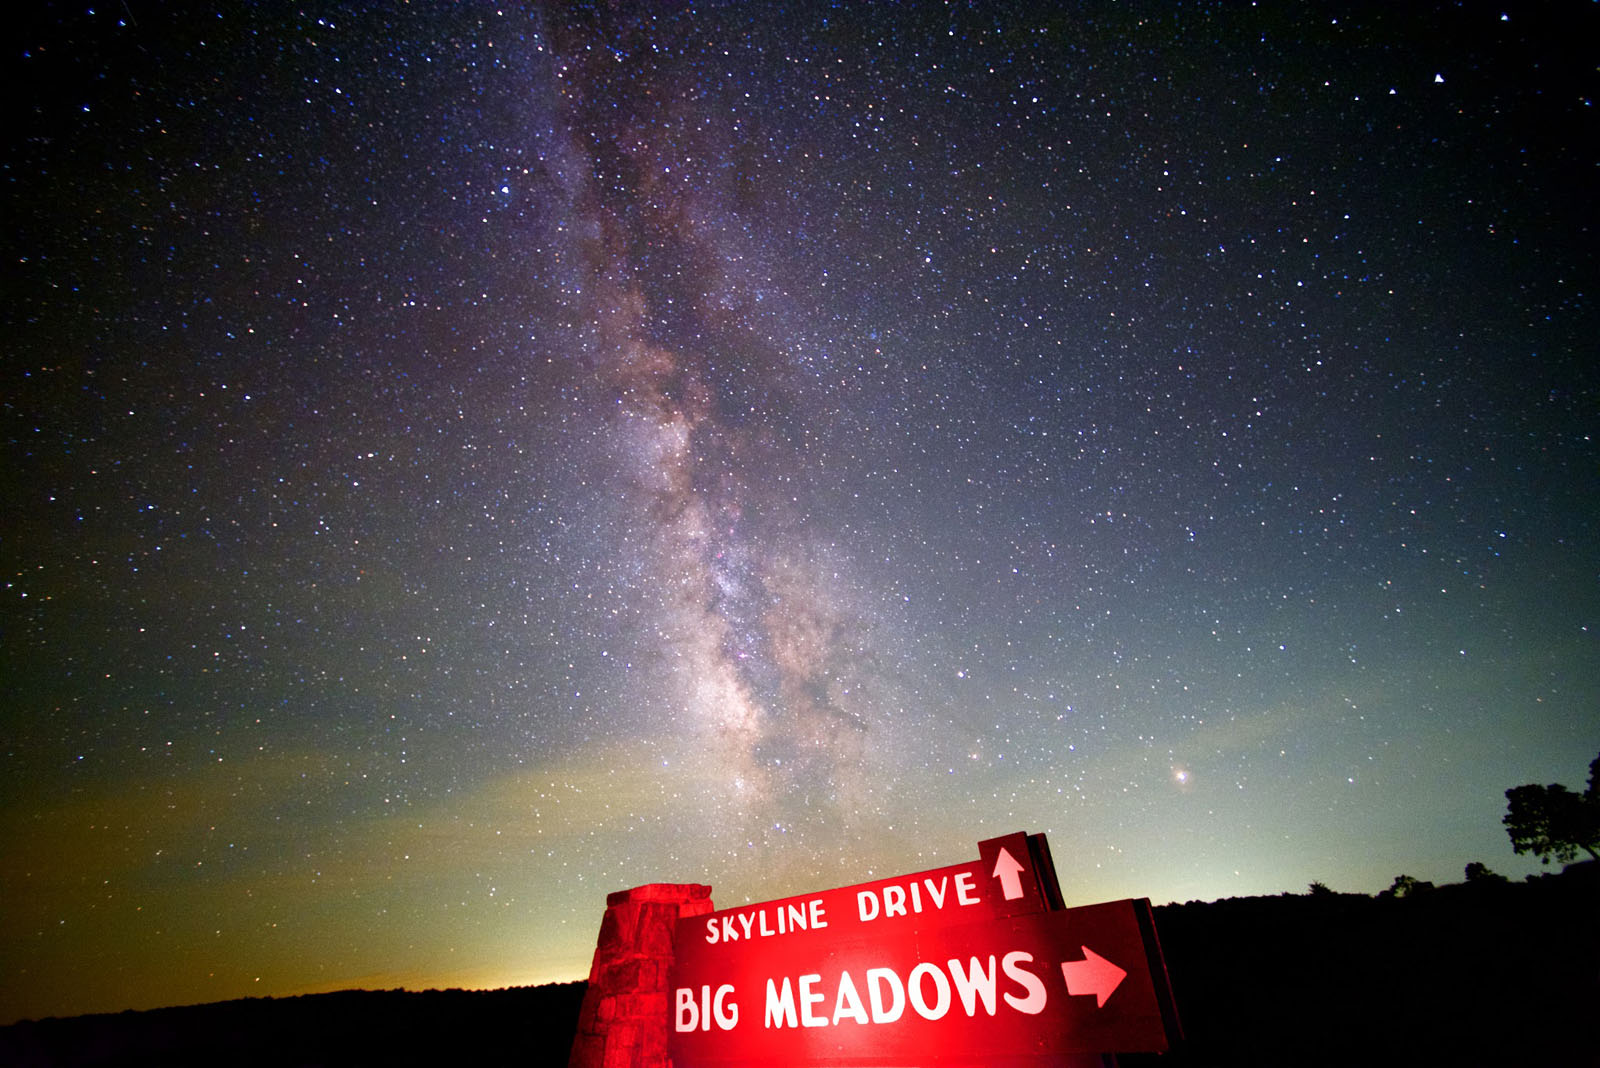 「drive stars night」の画像検索結果